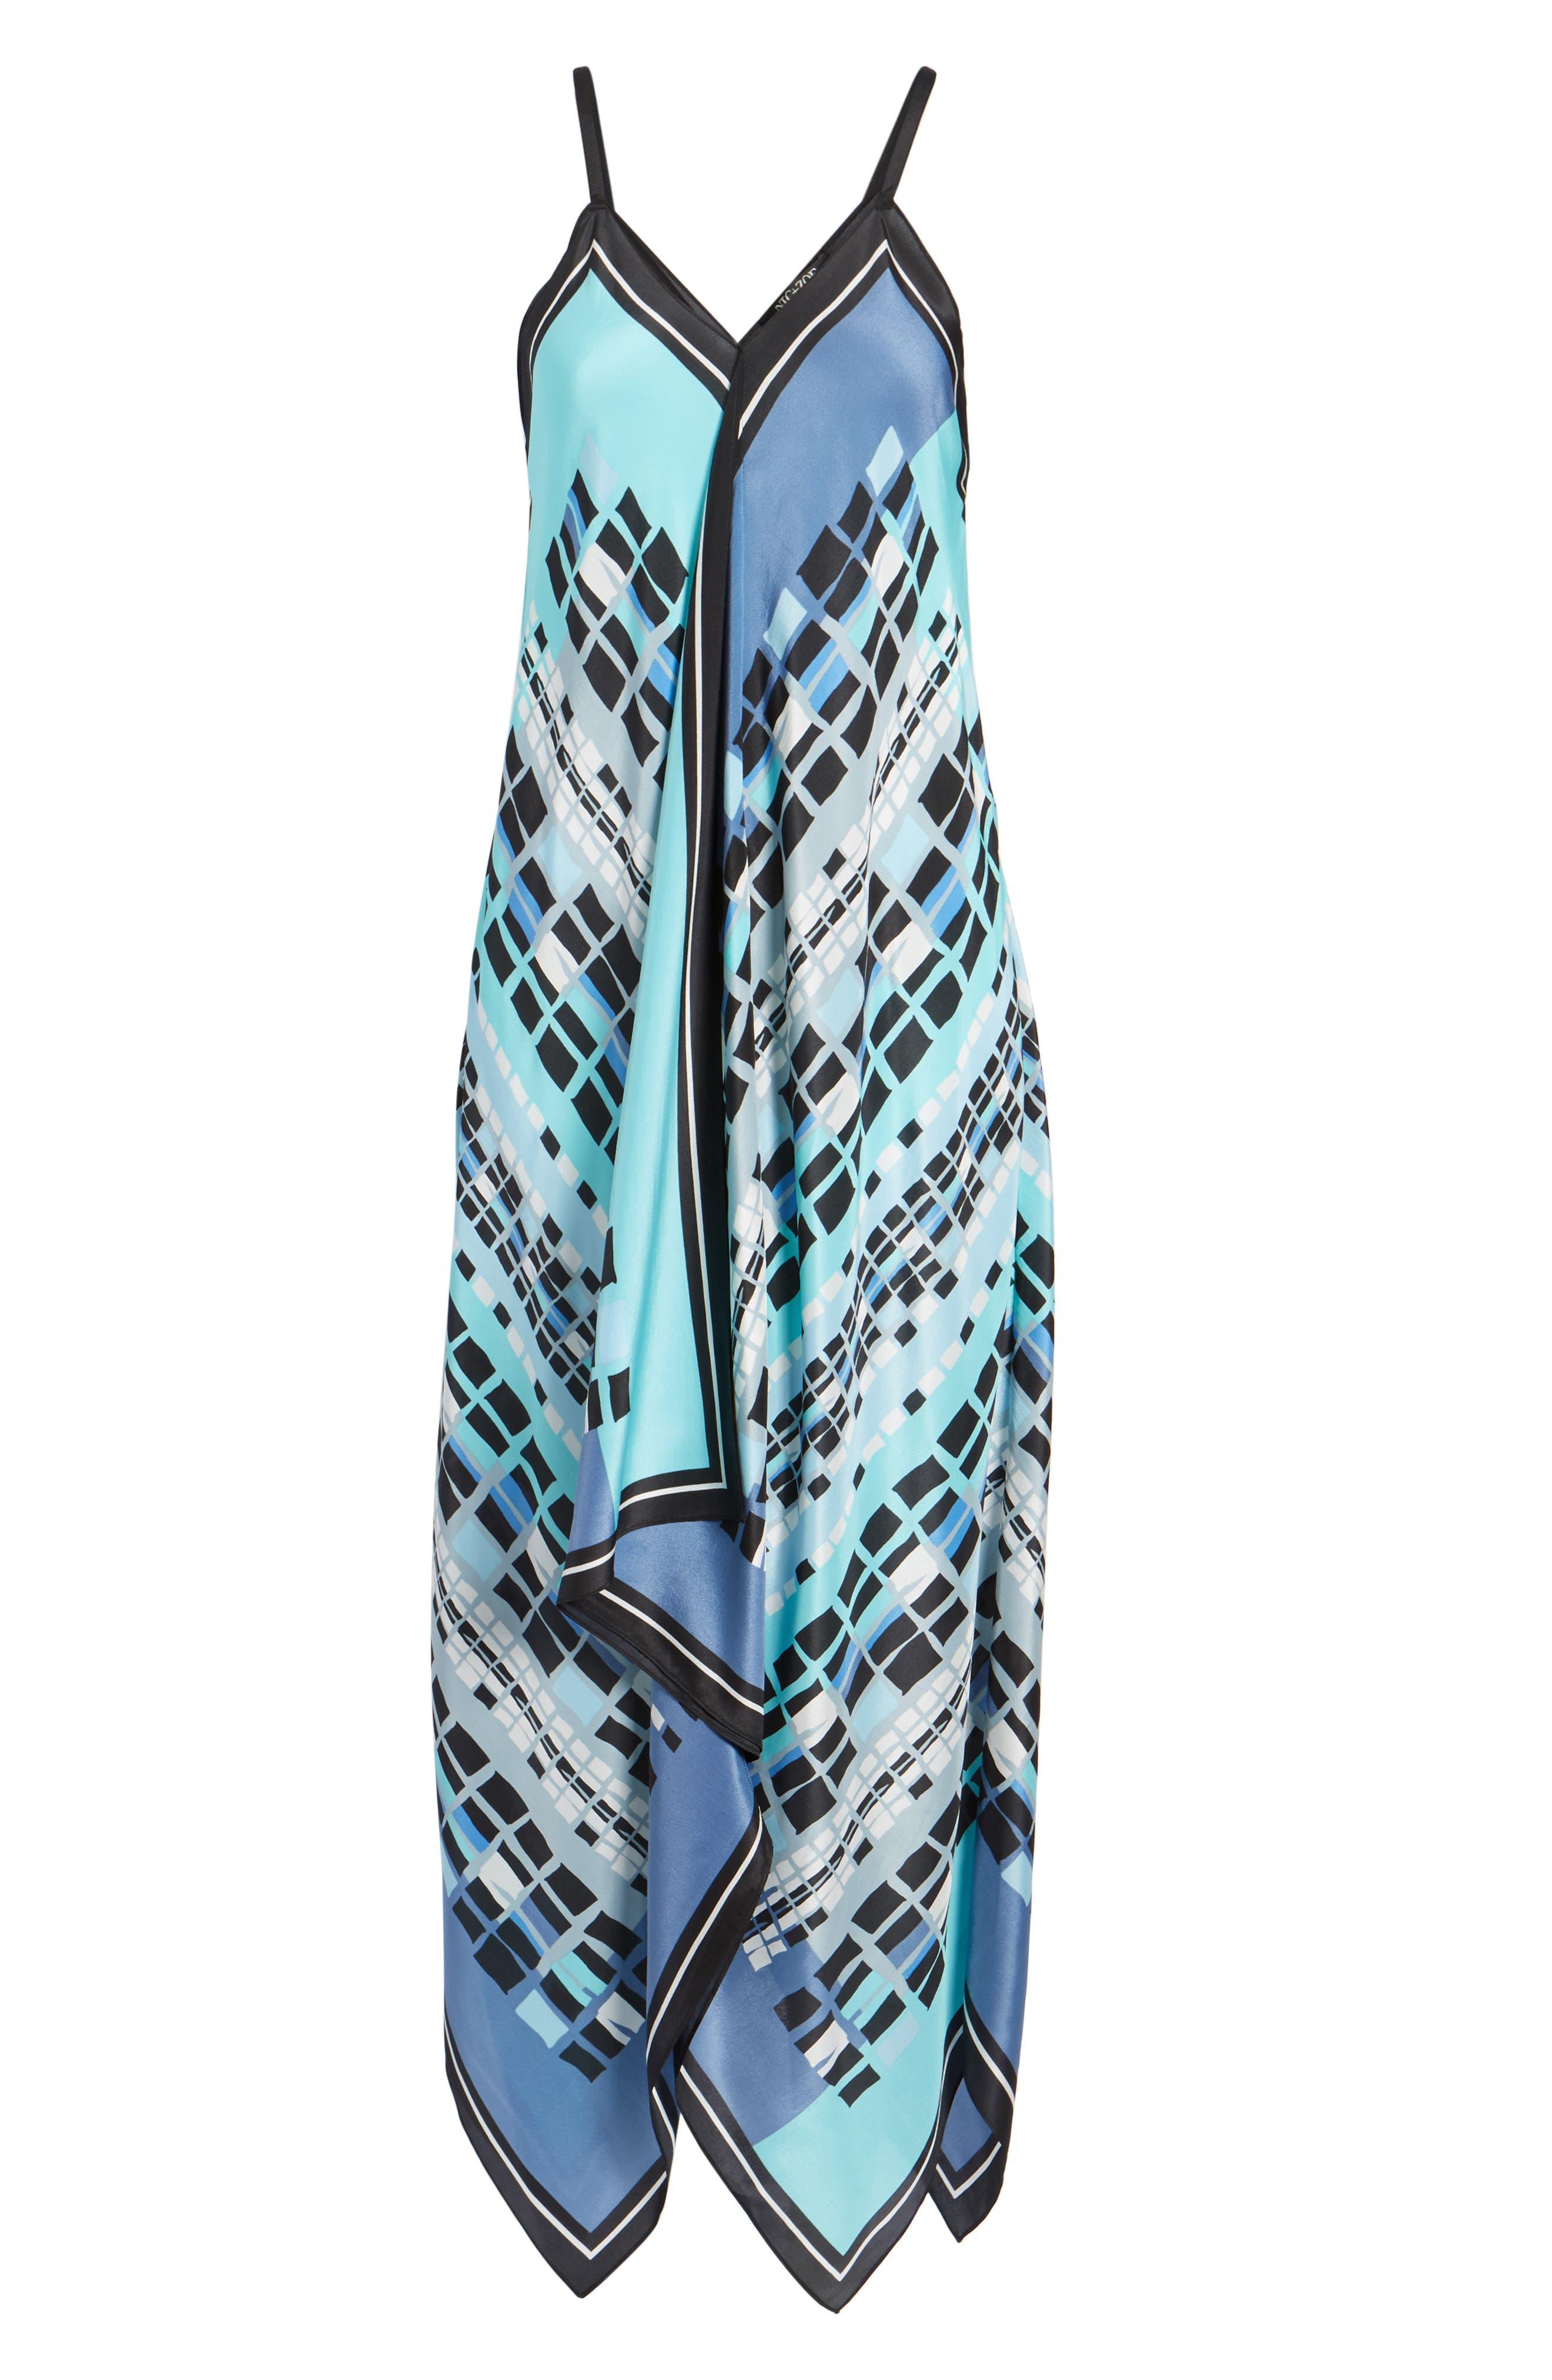 From Above Dress Silk Blend Maxi Dress,                             Alternate thumbnail 7, color,                             490